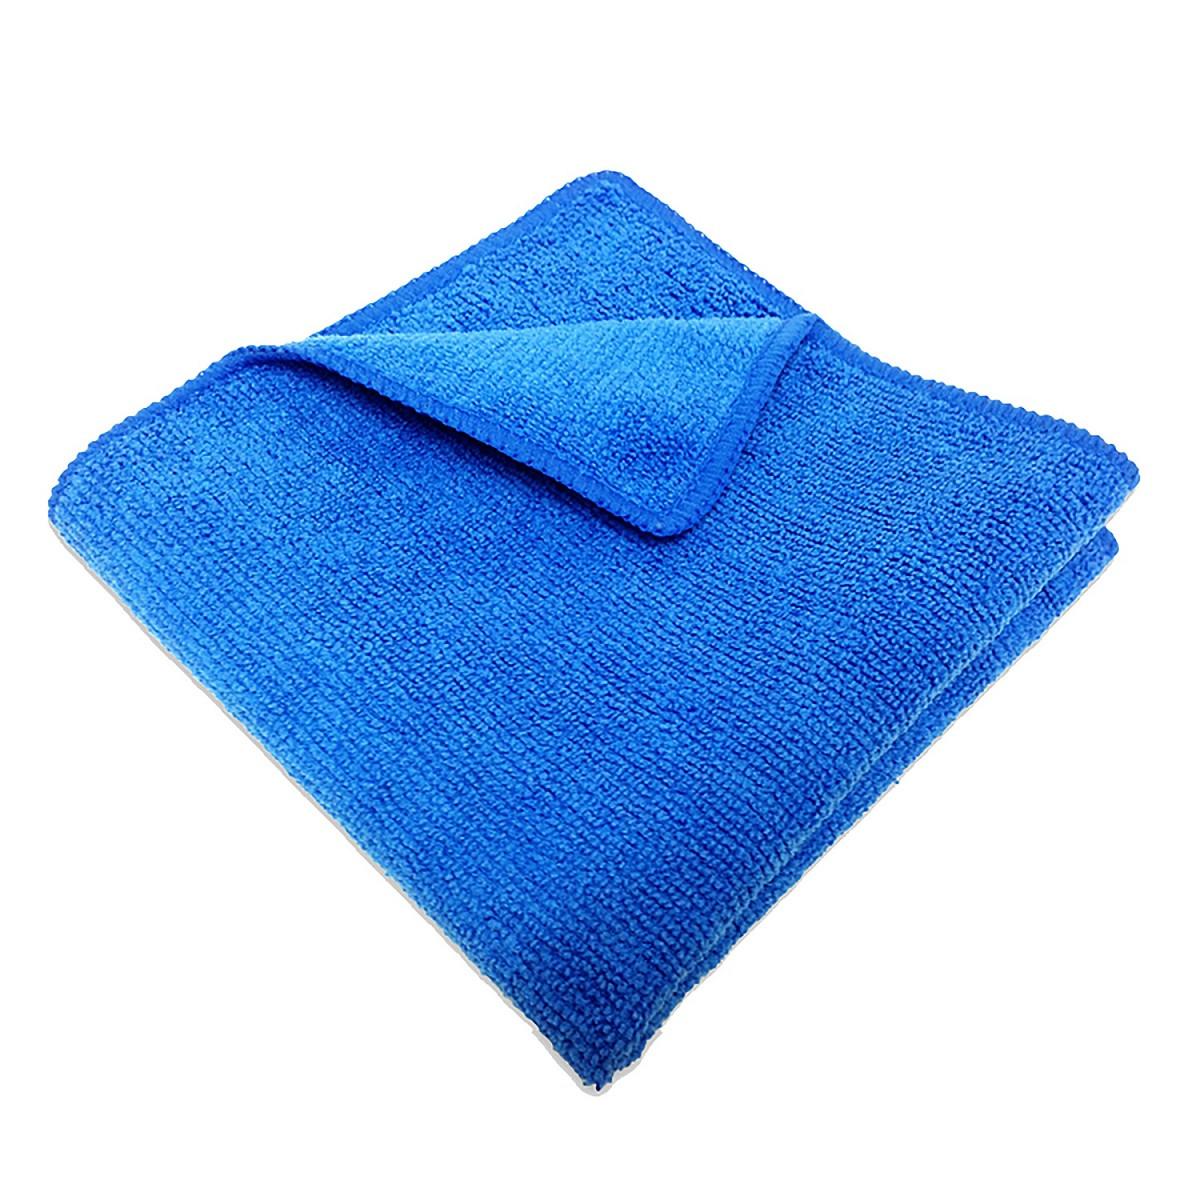 Салфетка микрофибра 220 г/м 30*30 (300 шт) короб синяя